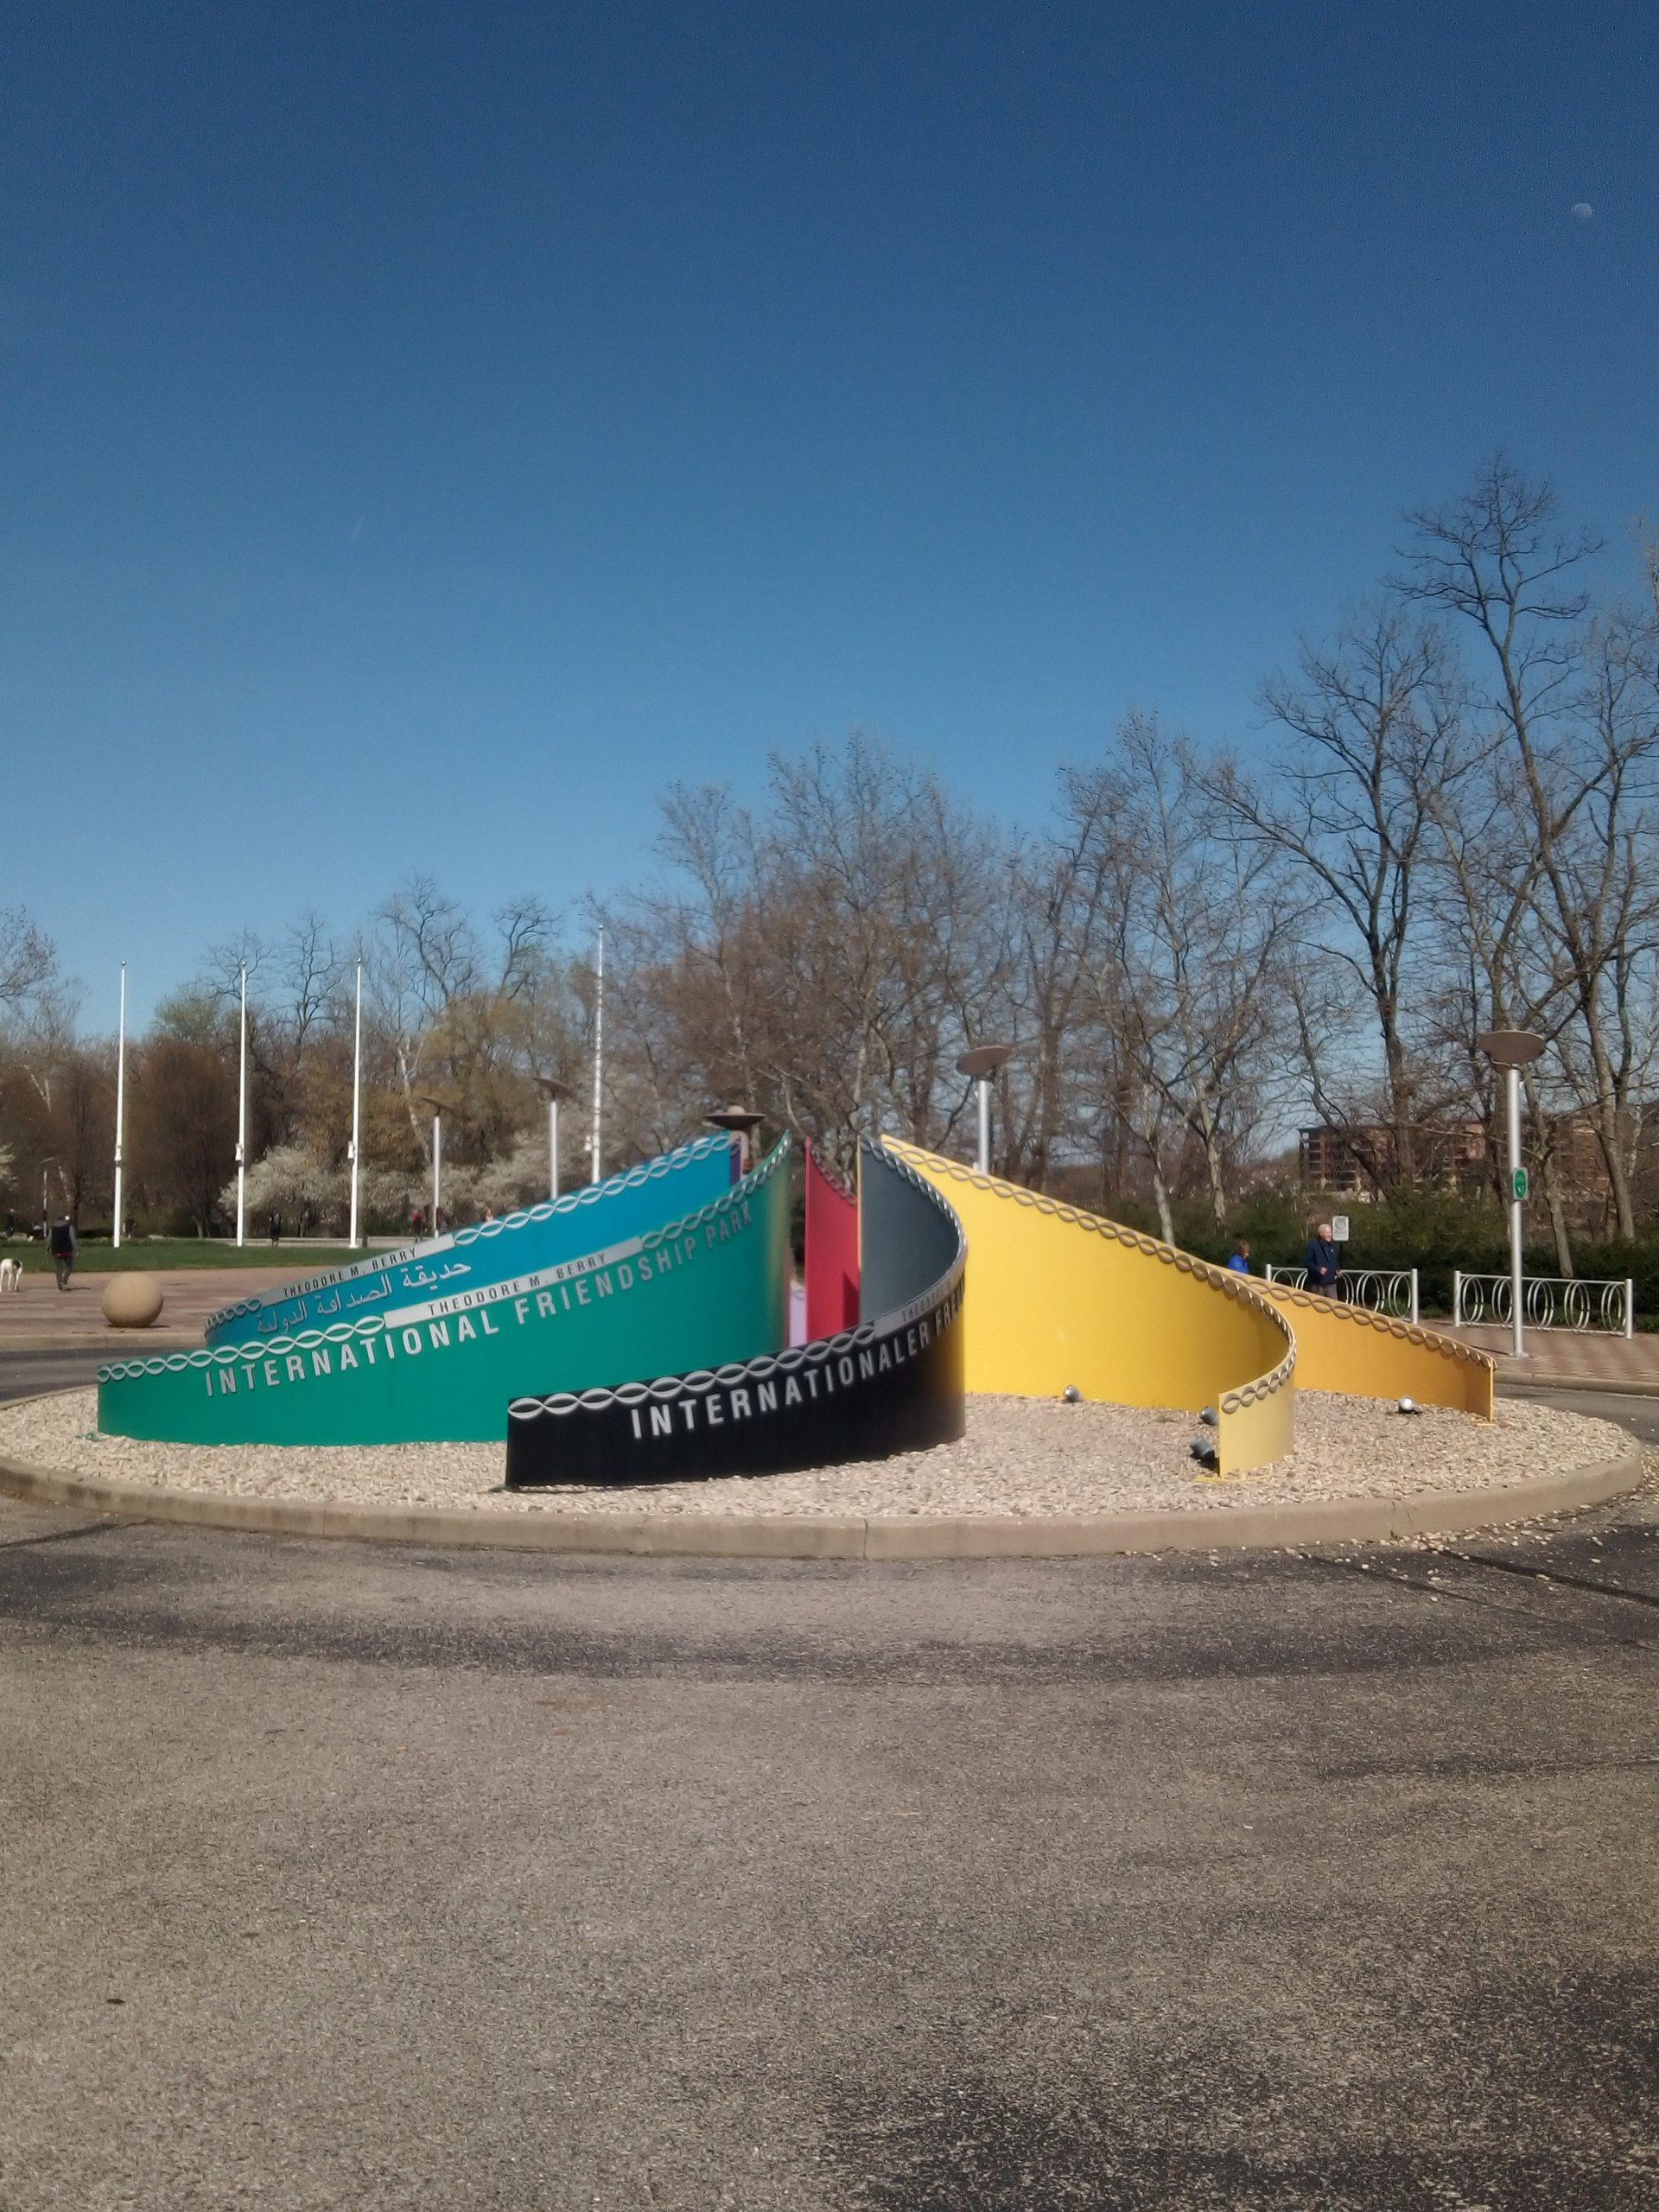 International Friendship Park in Cincinnati, Ohio